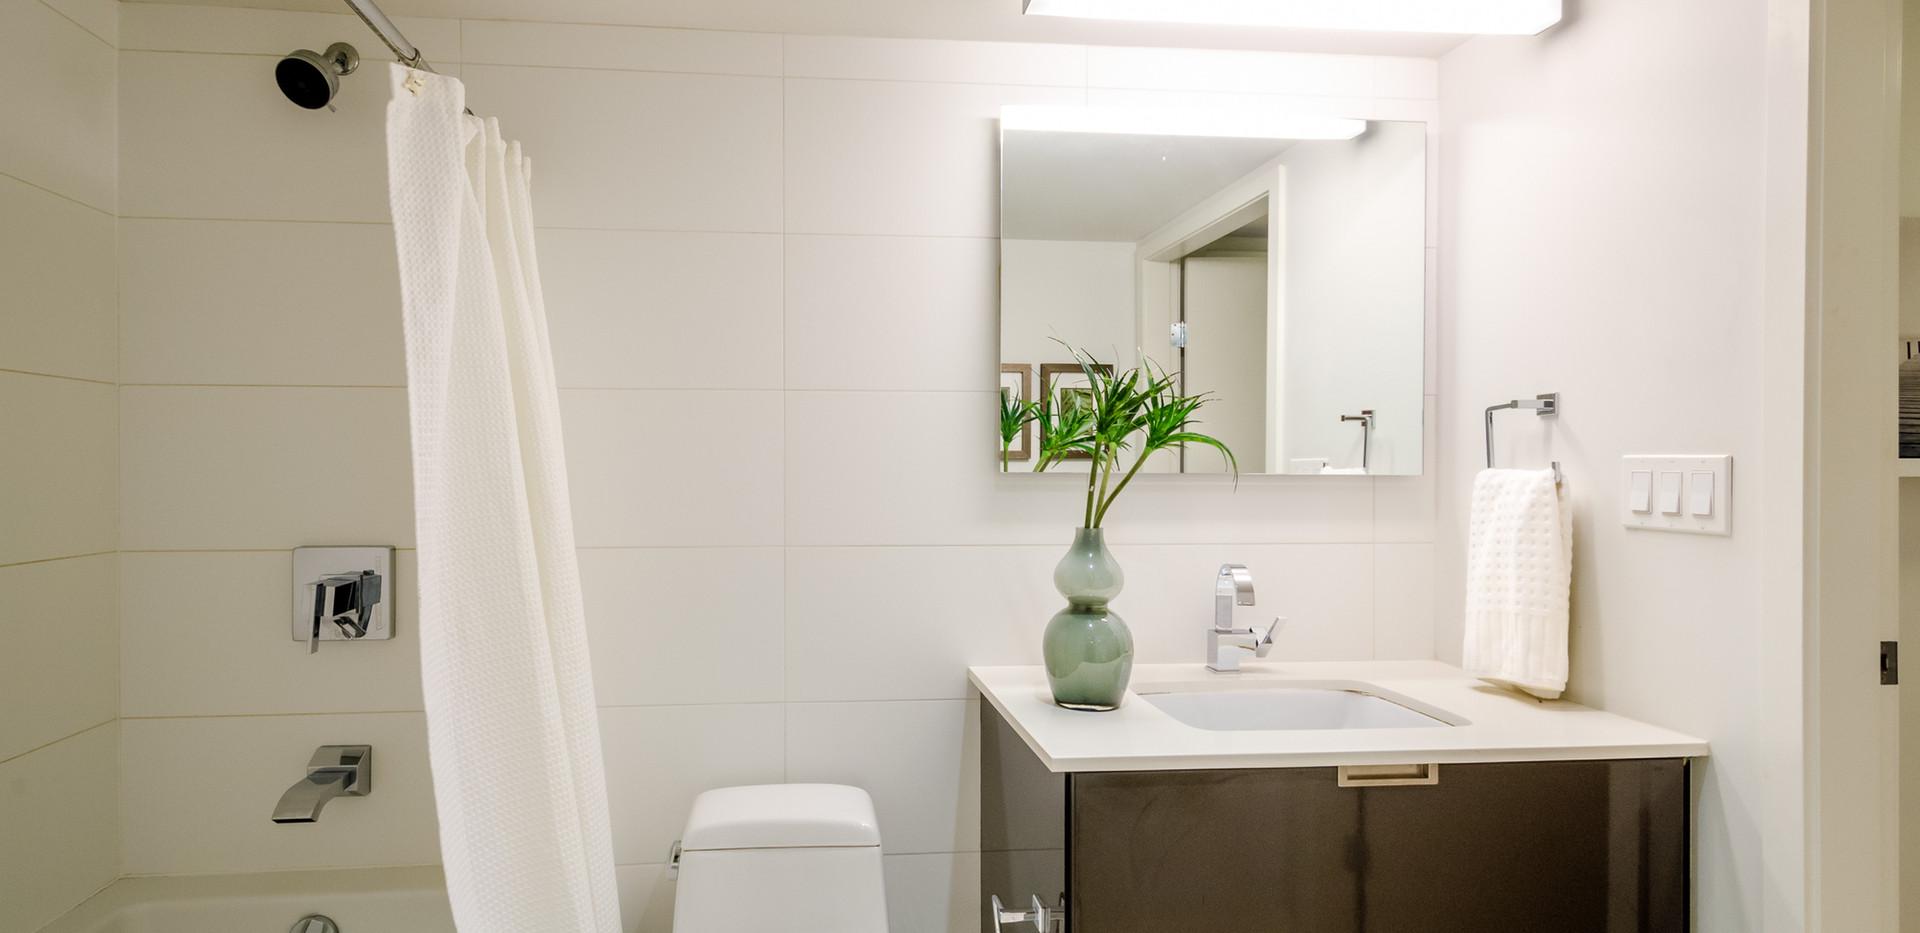 Bathroom Restructure PRJ 01